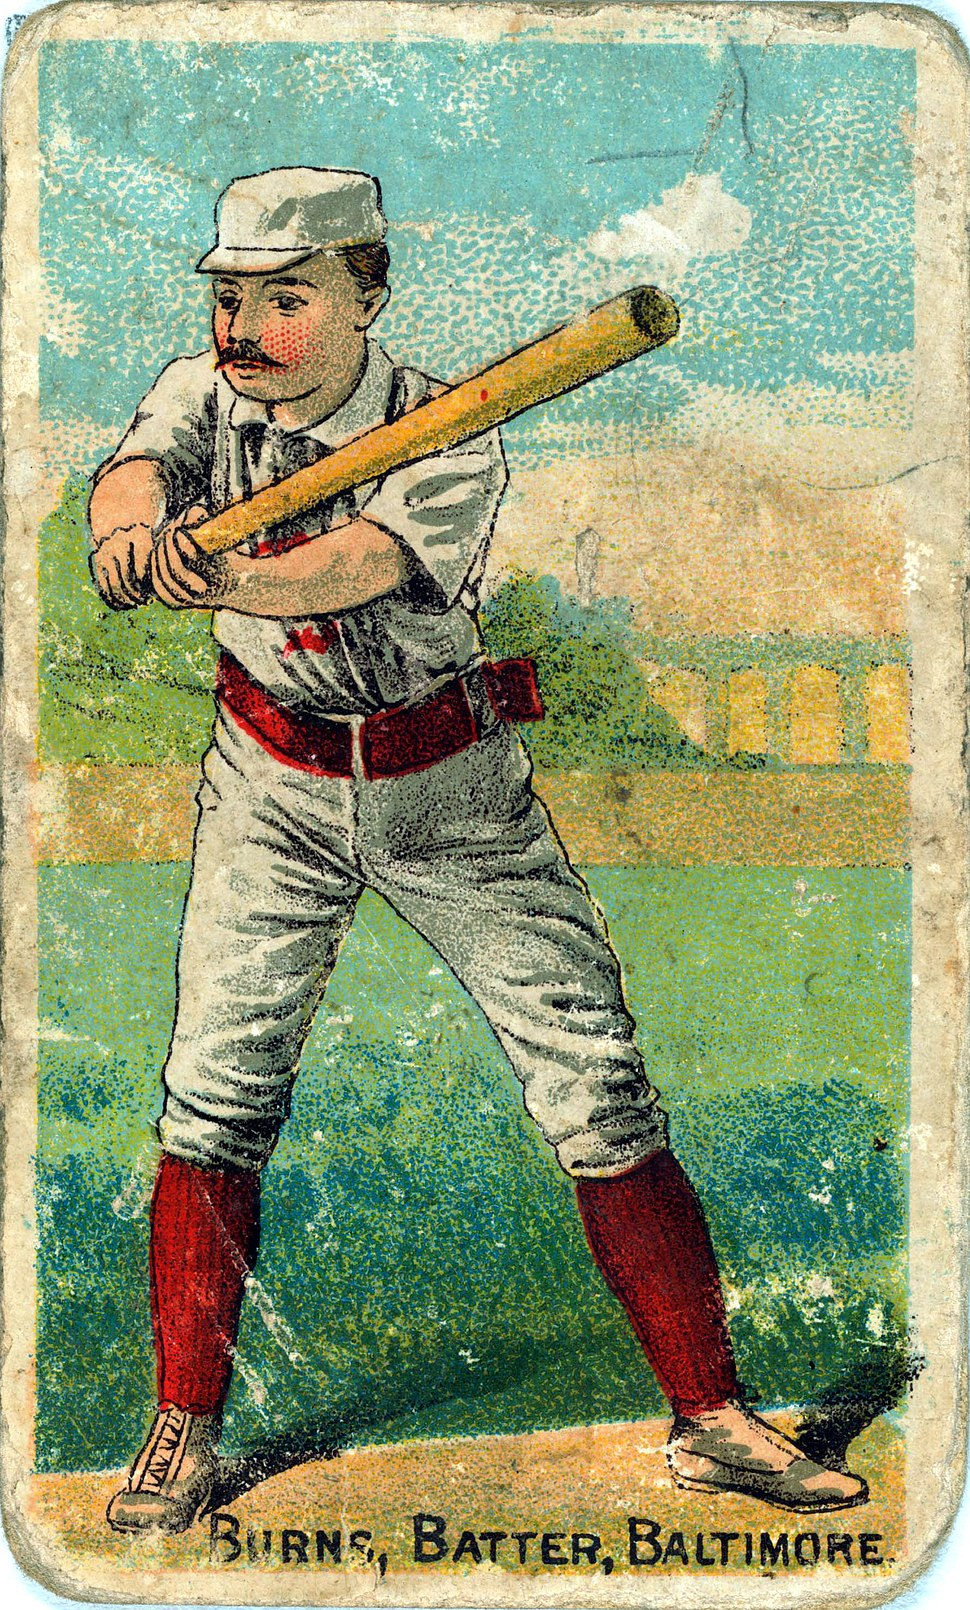 Oyster Burns baseball card